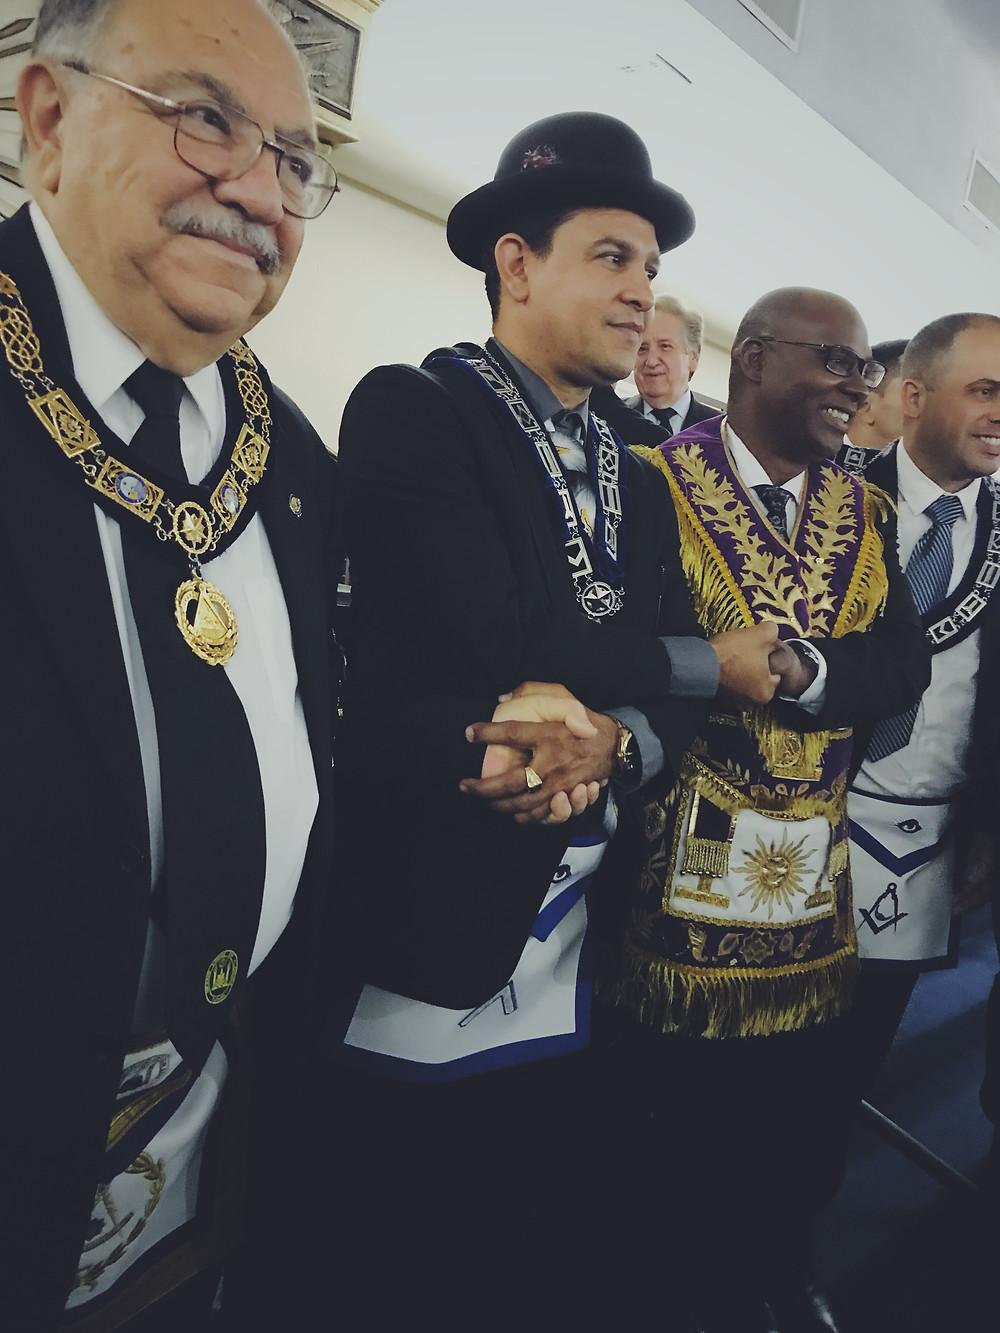 Bonds of Brotherhood between Grand Lodges of FL & Cuba